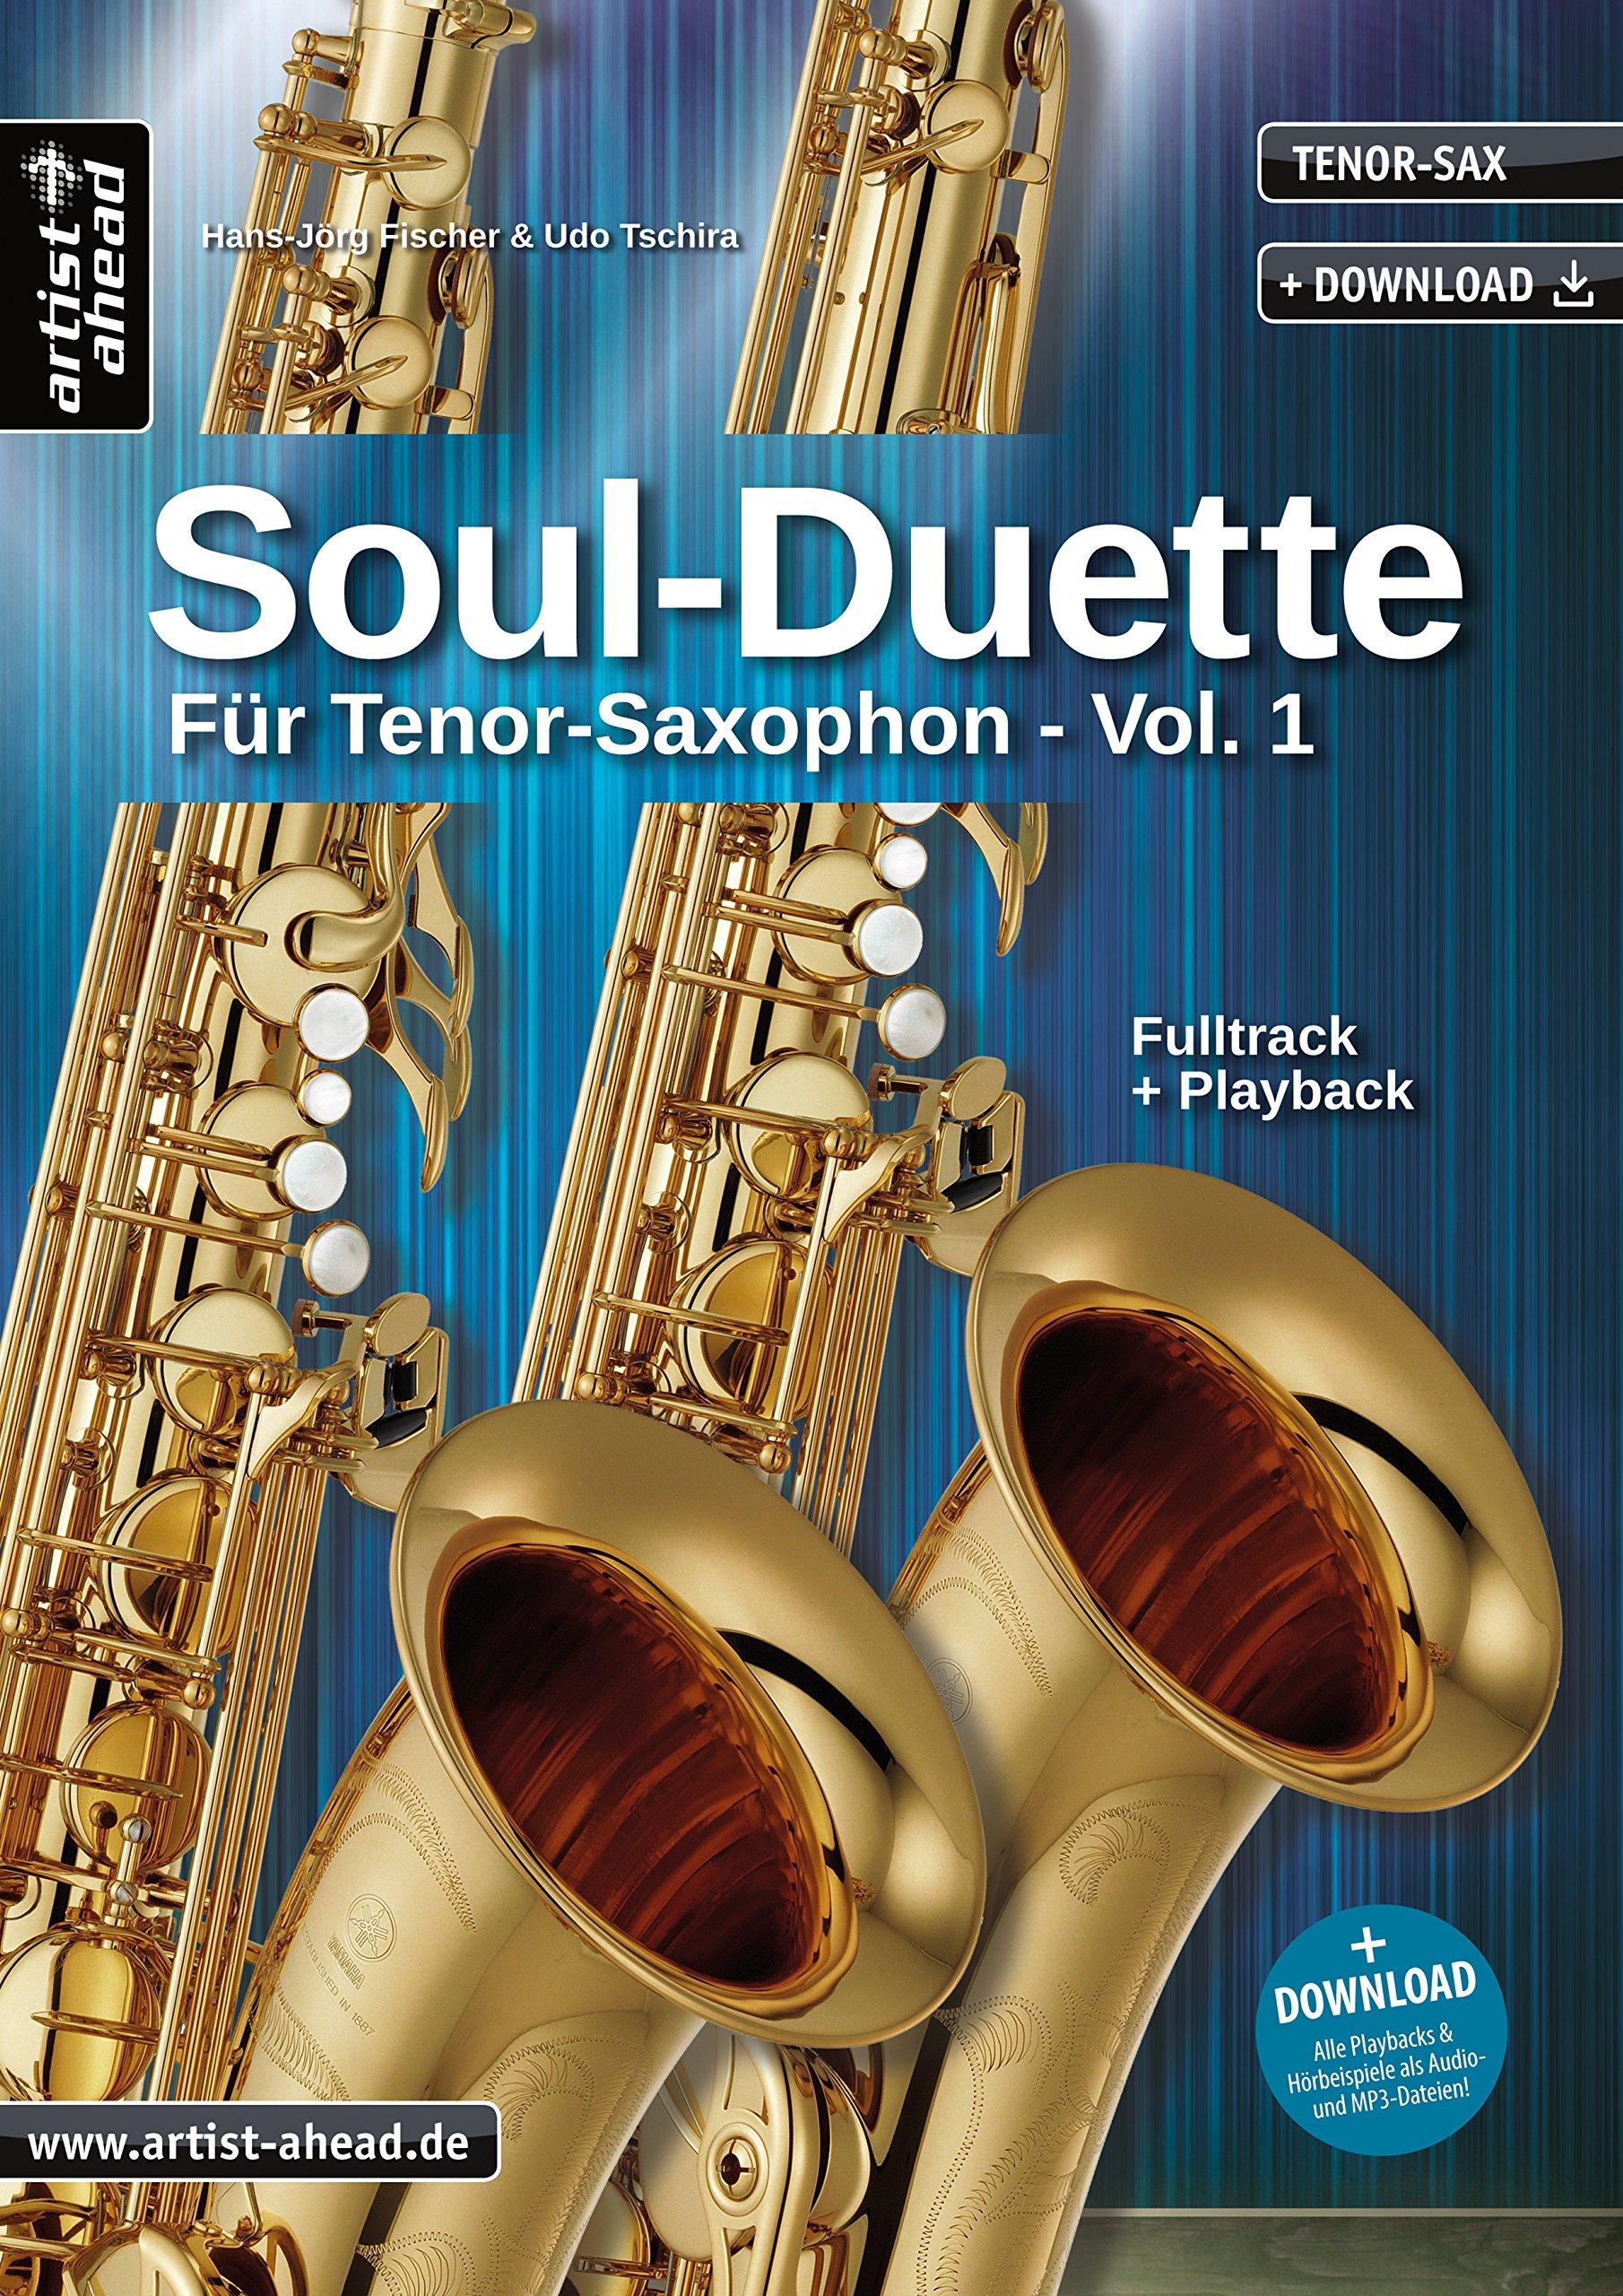 Soul-Duette für Tenor-Saxophon - Vol. 1: Sechs Playalongs für zwei Tenor- oder Alt- und Tenor-Saxophon (inkl. Download). Spielbuch. Songbook. Playbacks. Musiknoten. Broschiert – 19. Juli 2018 artist ahead 3866420641 Musikalien Soul and Funk